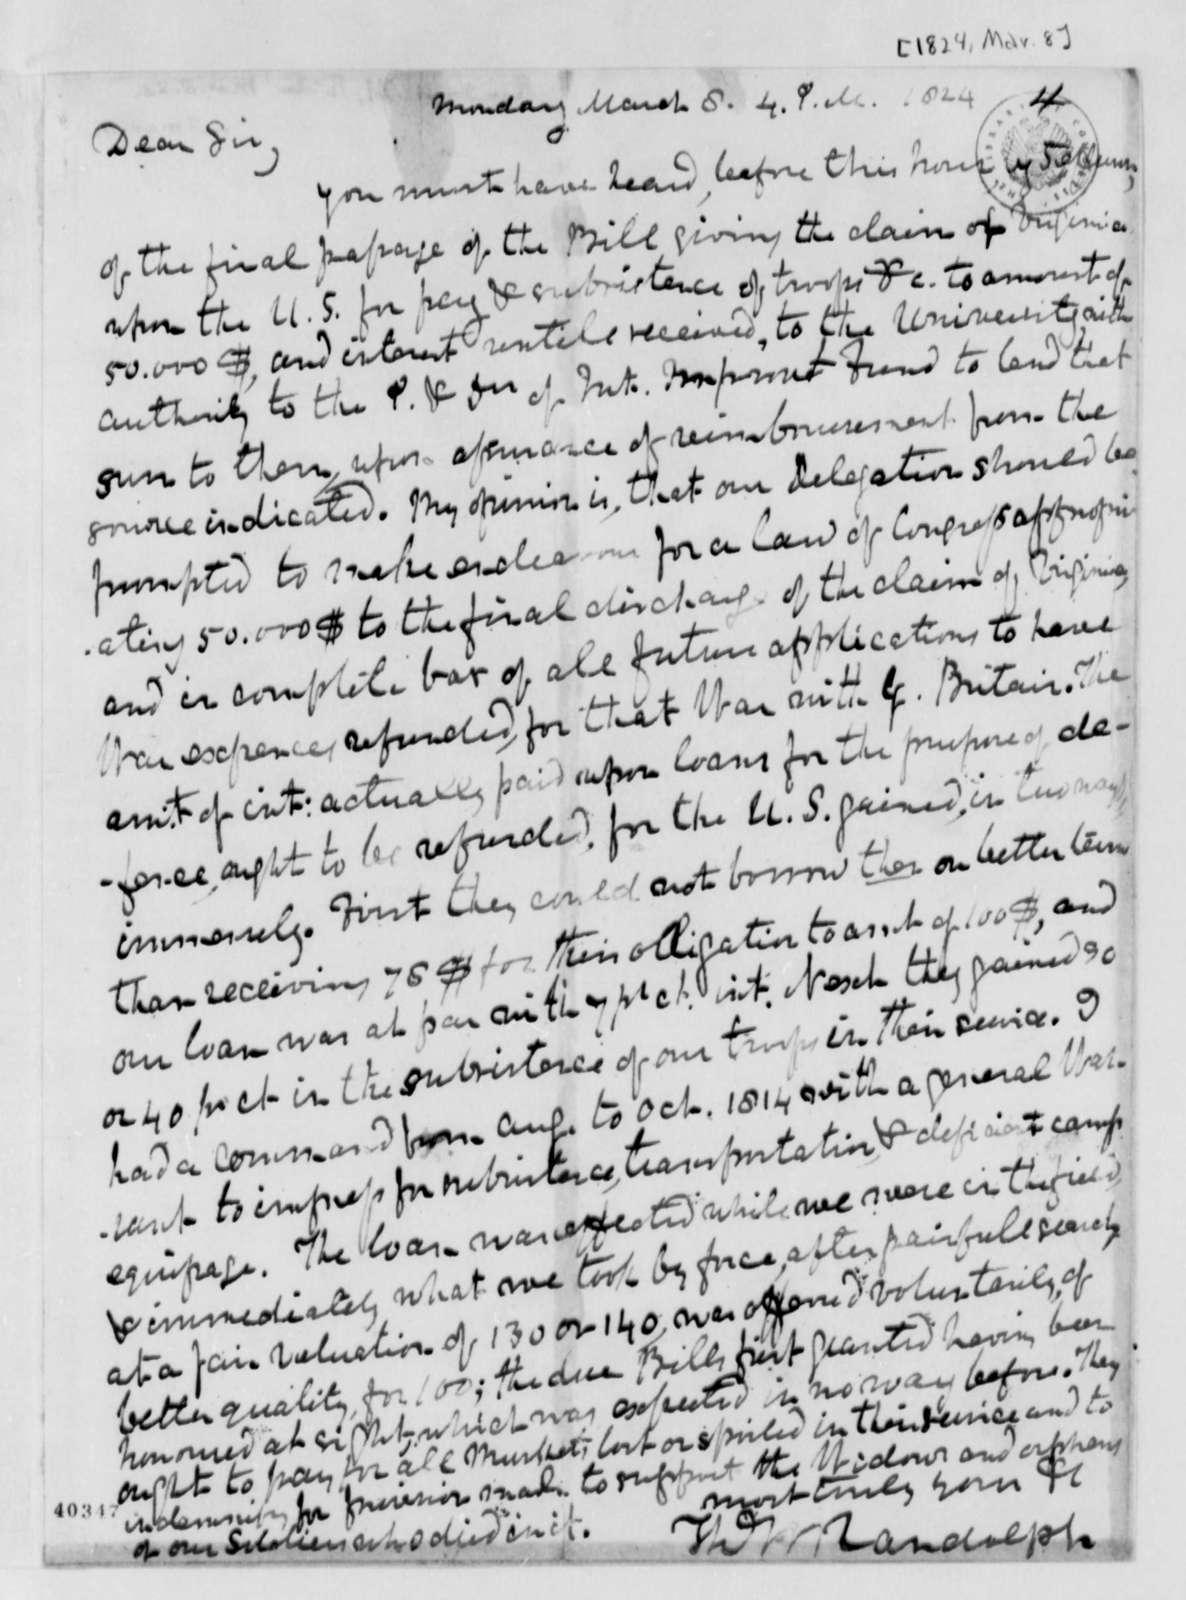 Thomas Mann Randolph, Jr. to Thomas Jefferson, March 8, 1824